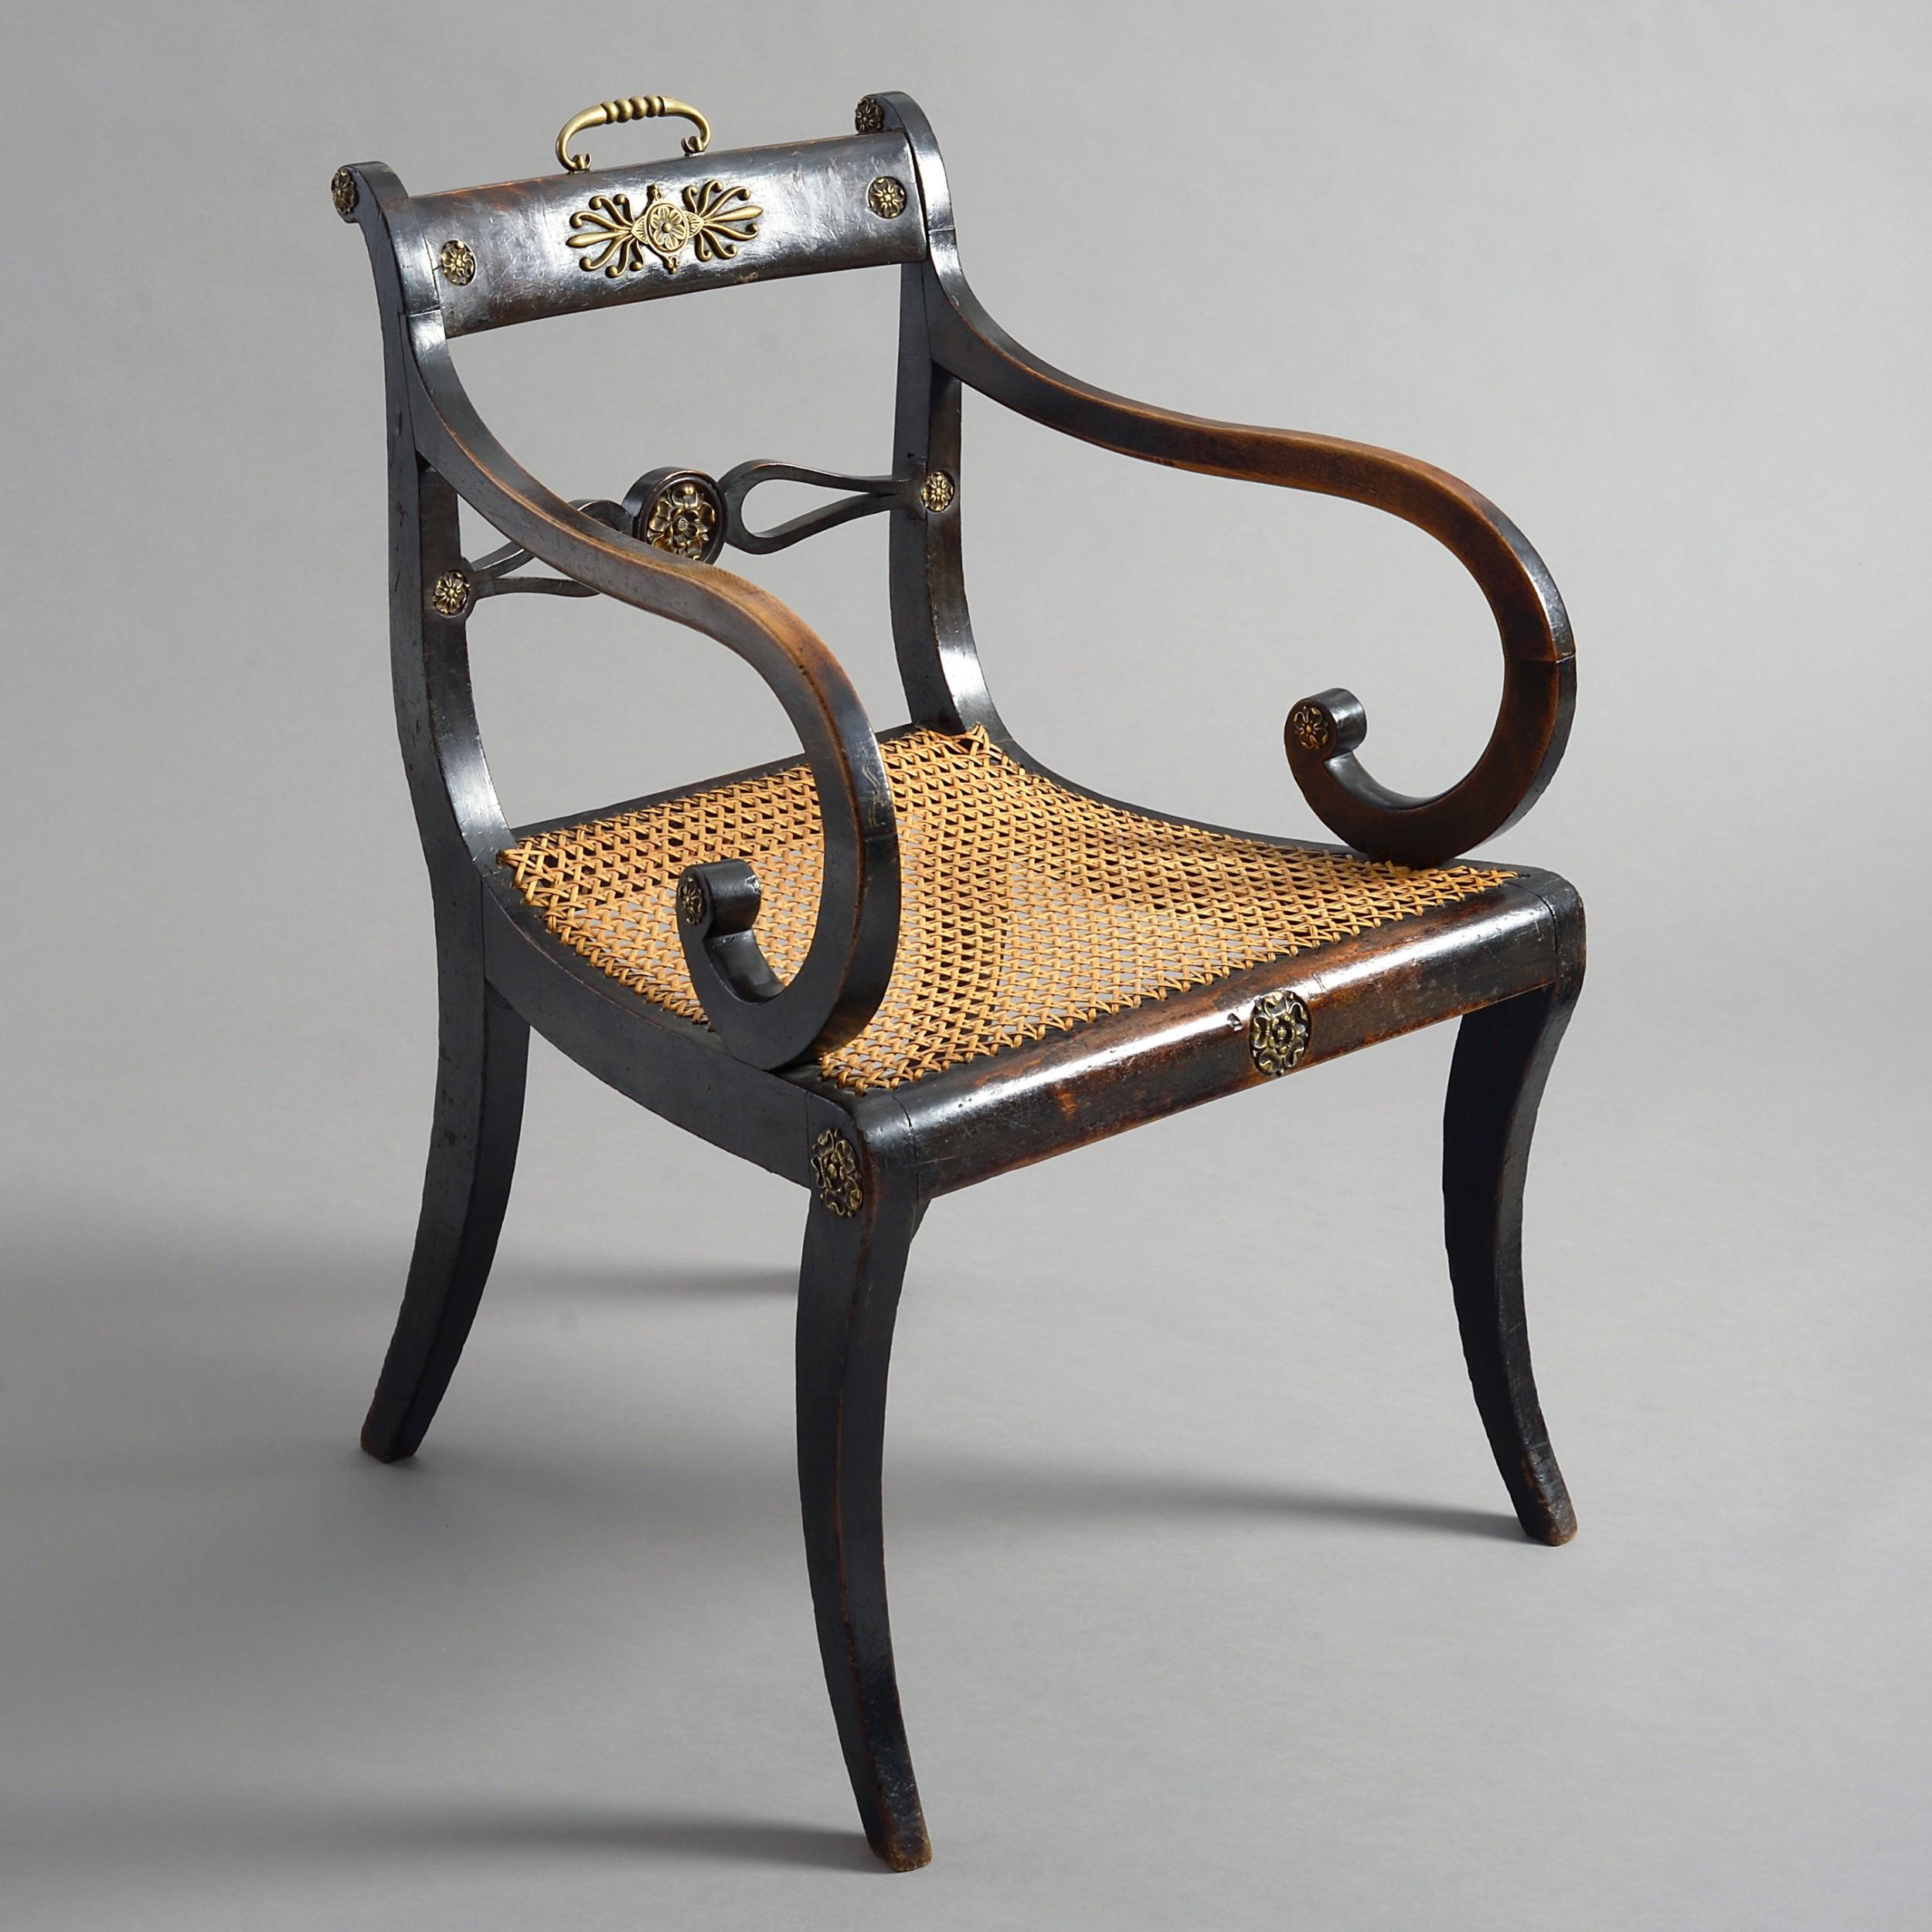 fine early 19th century regency period ebonised armchair or desk chair